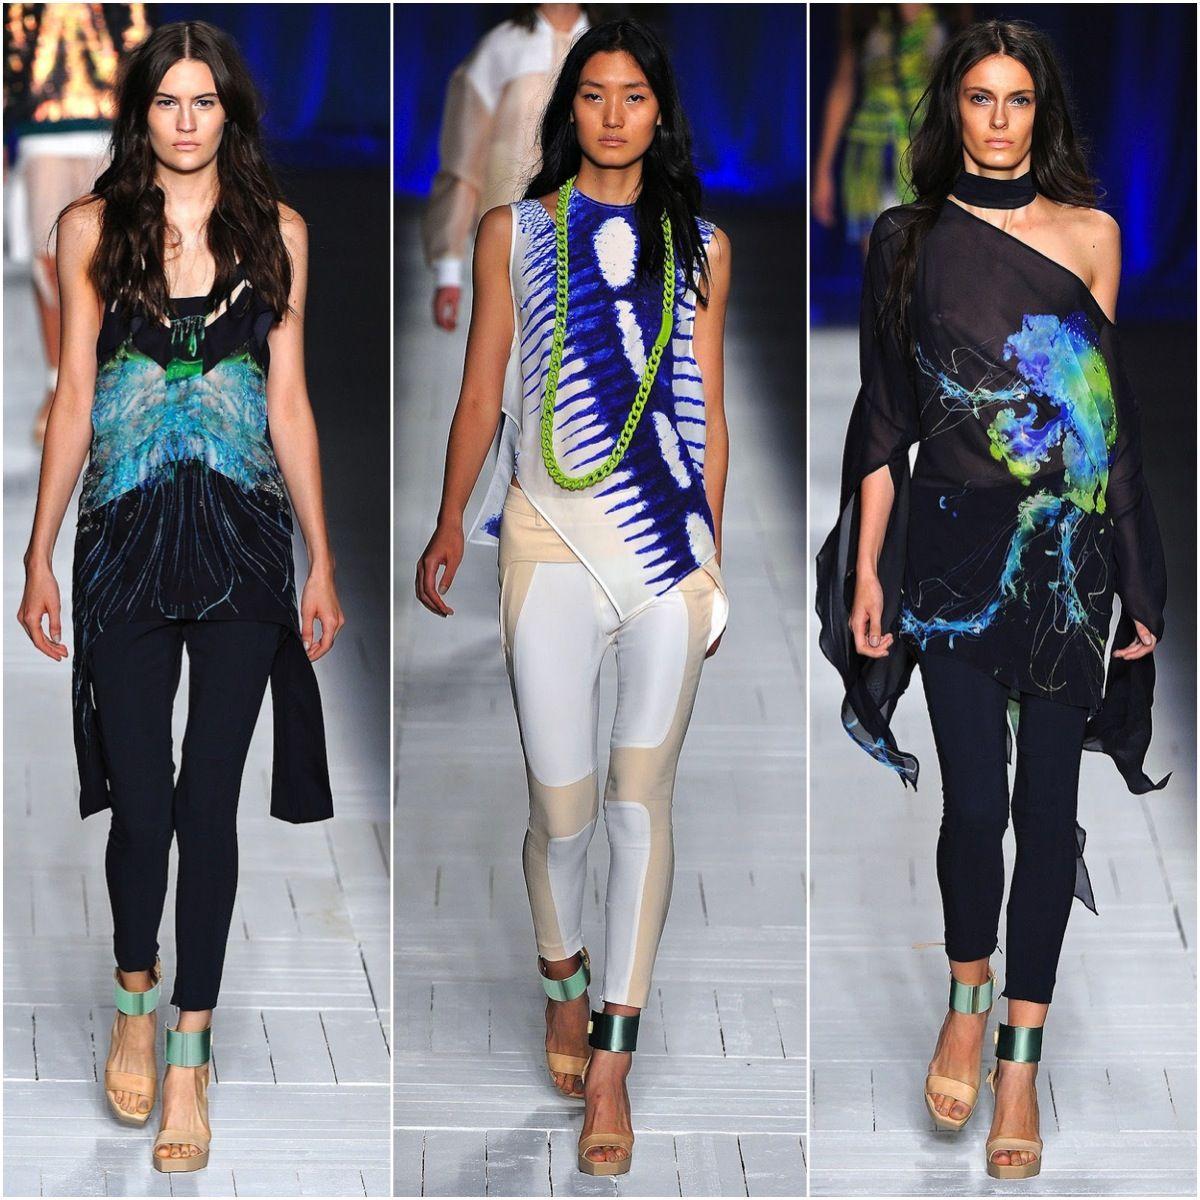 27. Just Cavalli SS13 #MFW #FashionShow #Womenswear #runway #photoset